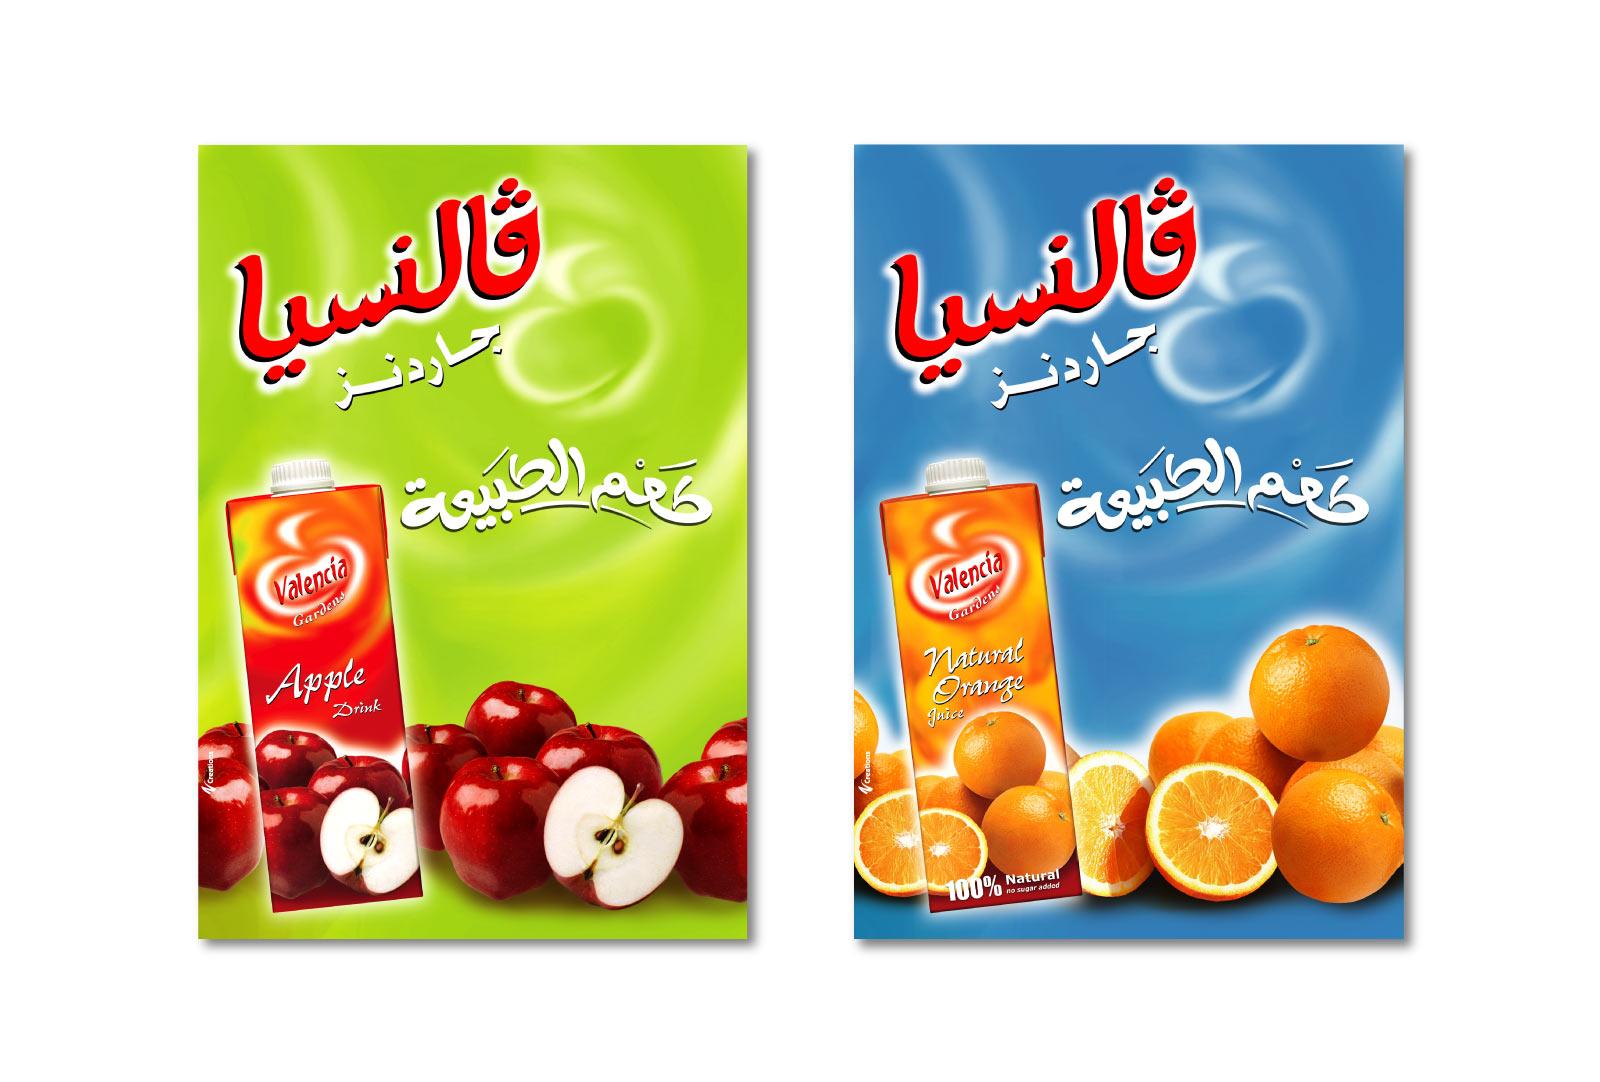 Hammoudeh-Valencia-Gardens-Juice-Ads